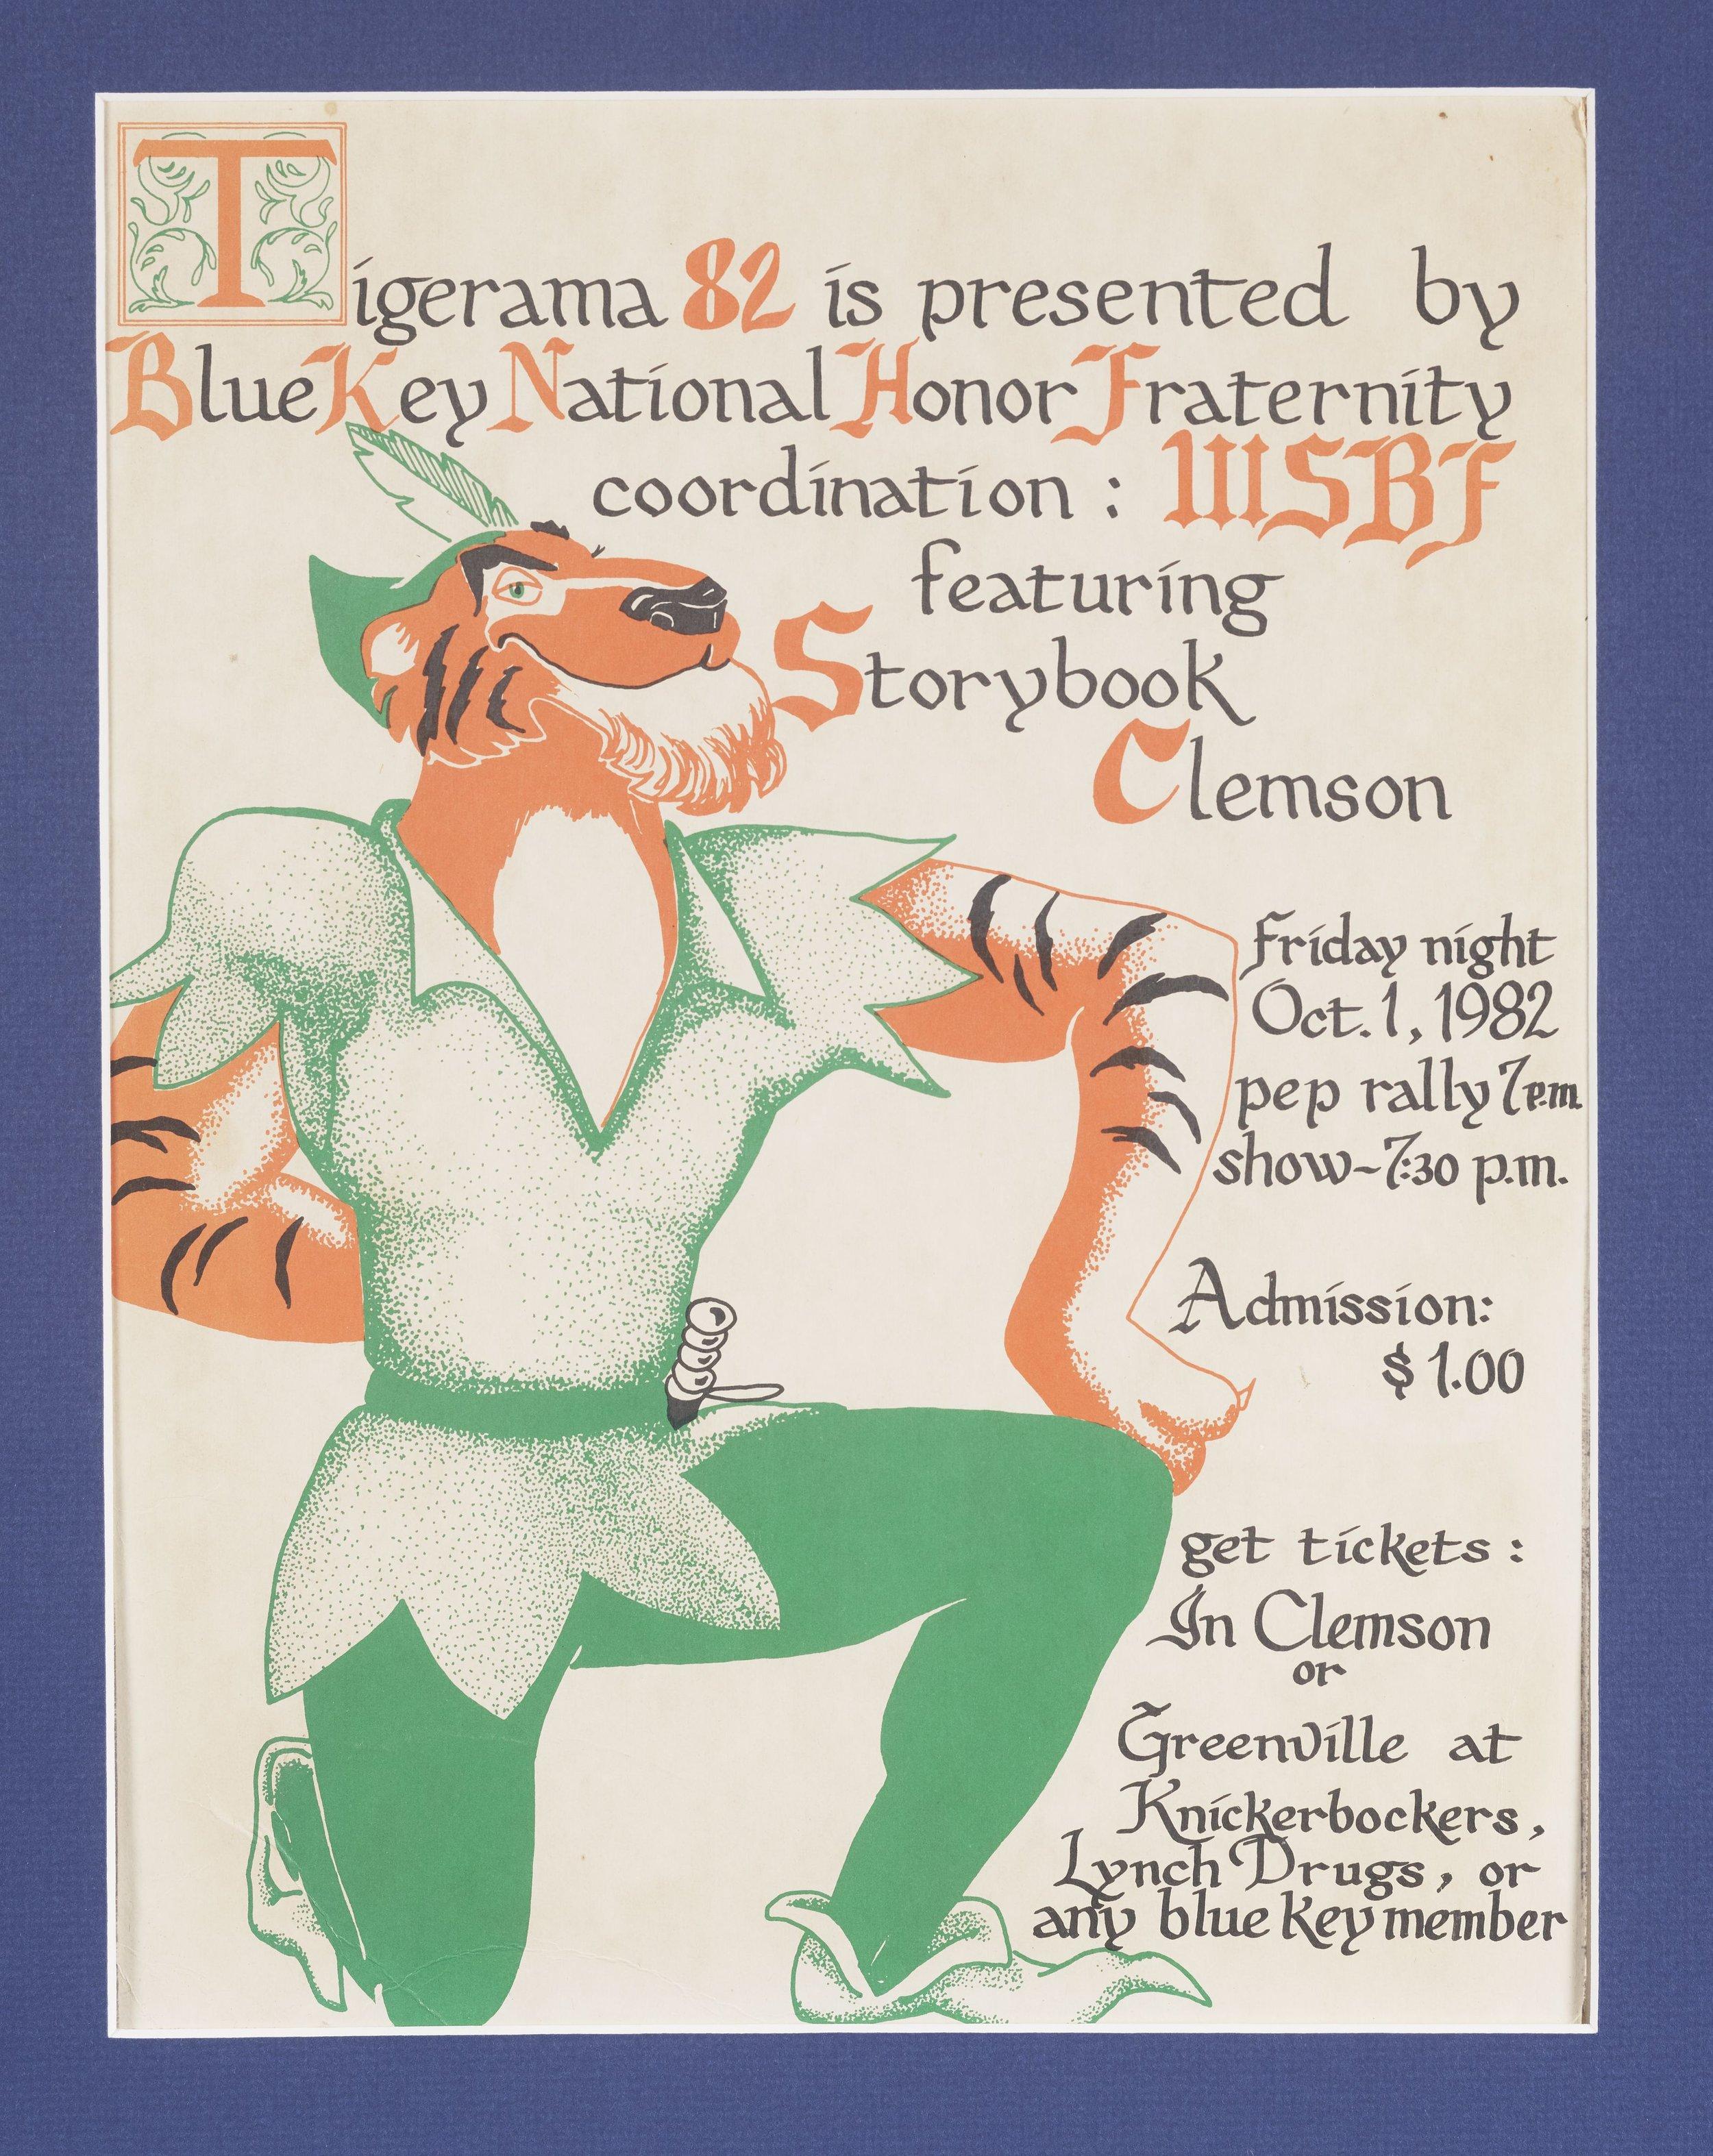 Tigerama 1981